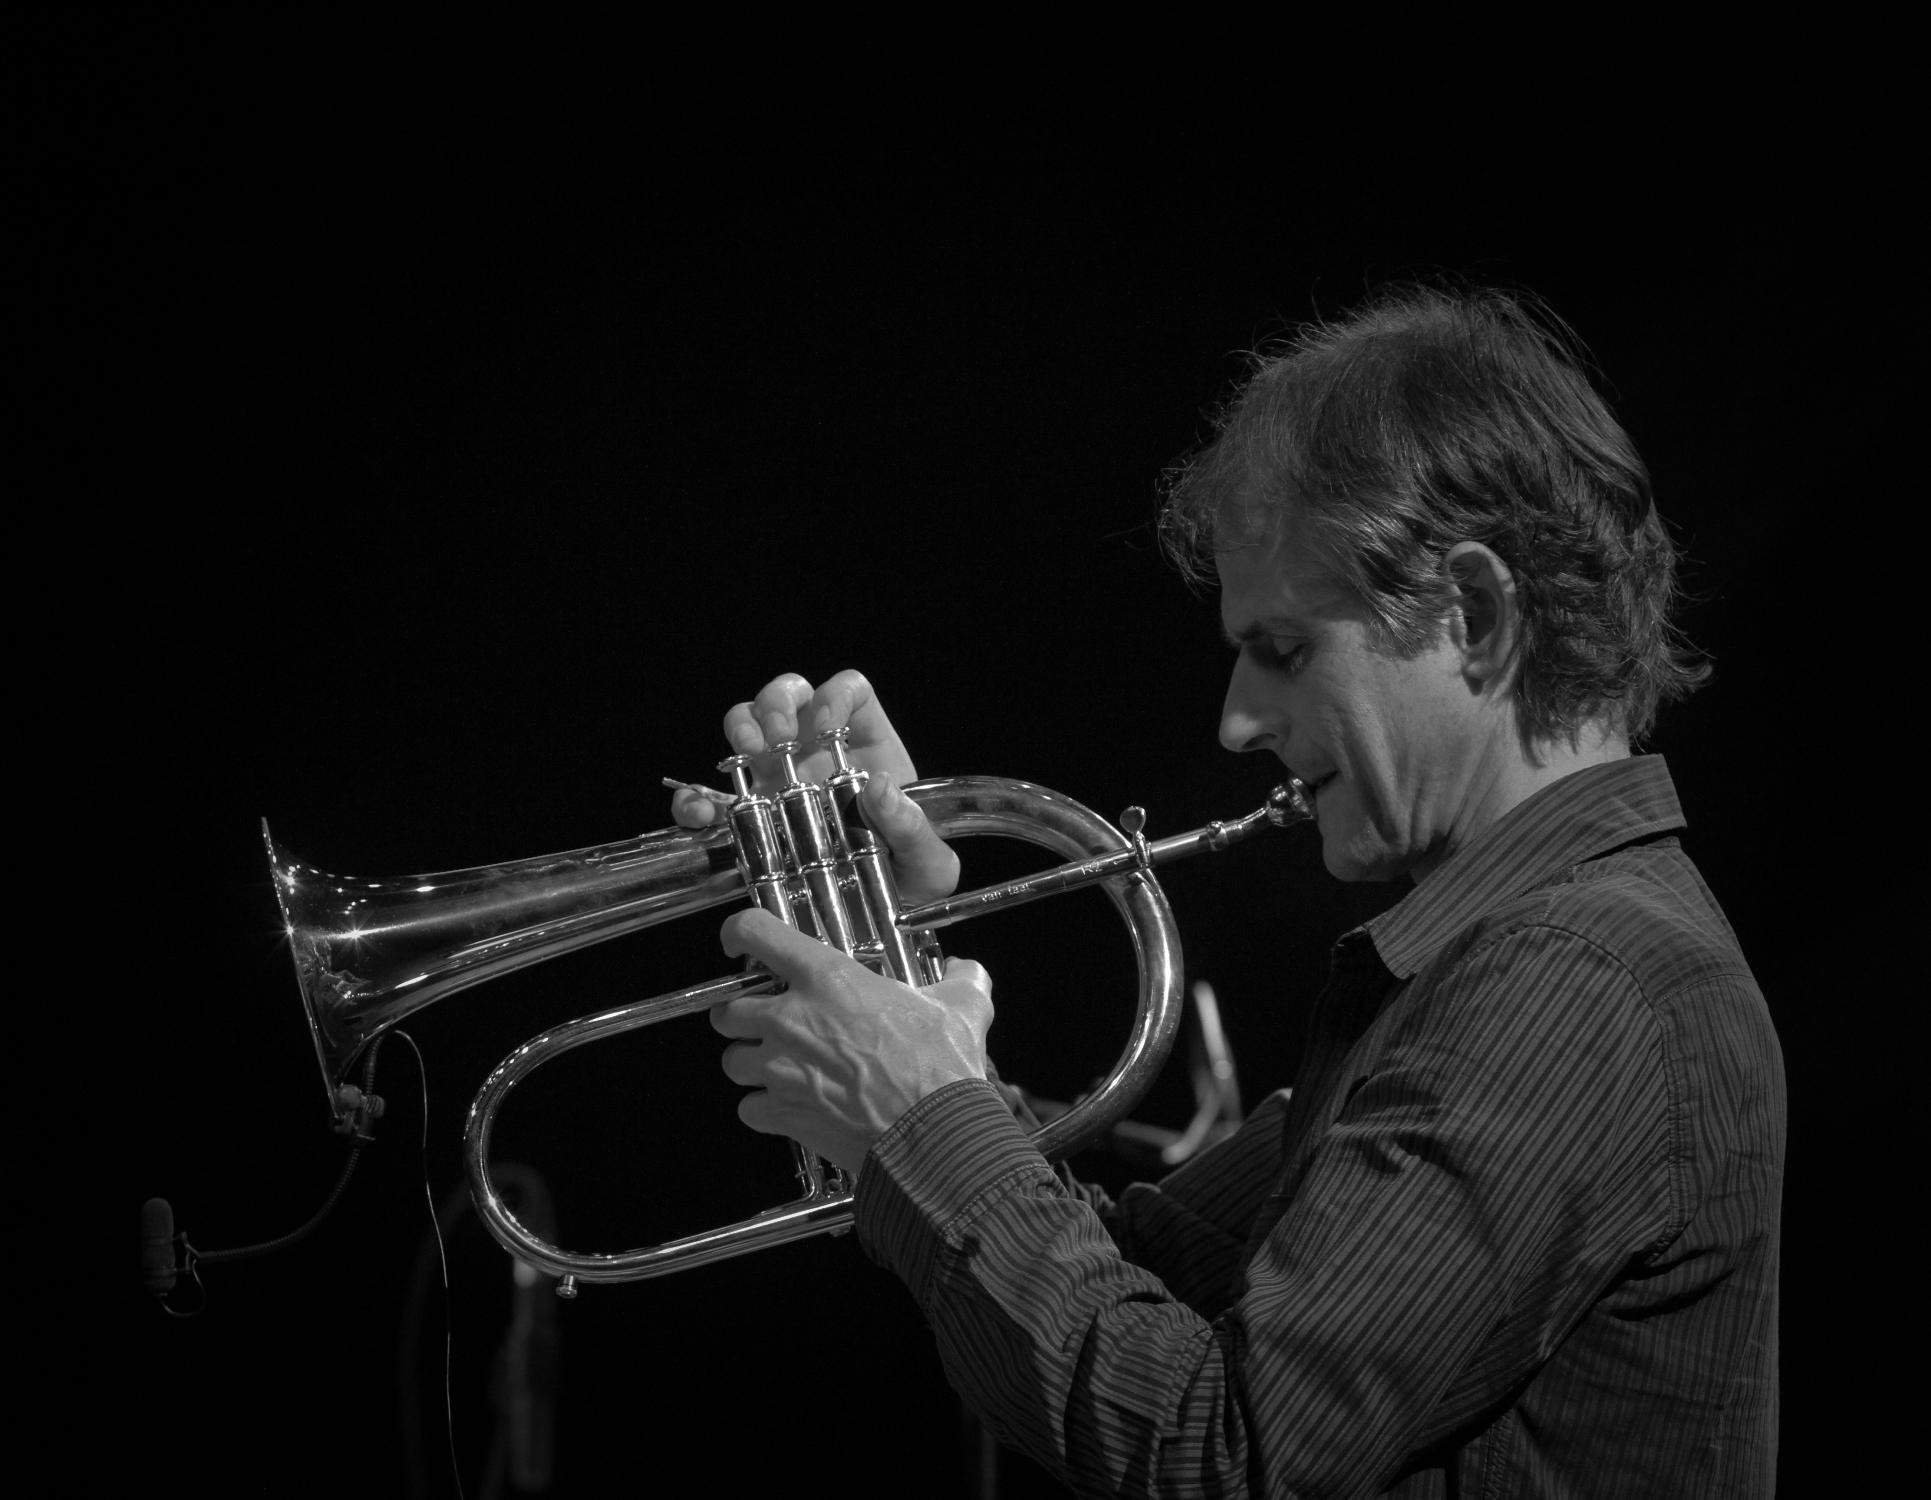 Markus stockhausen, valby summer jazz 2013, copenhagen, denmark